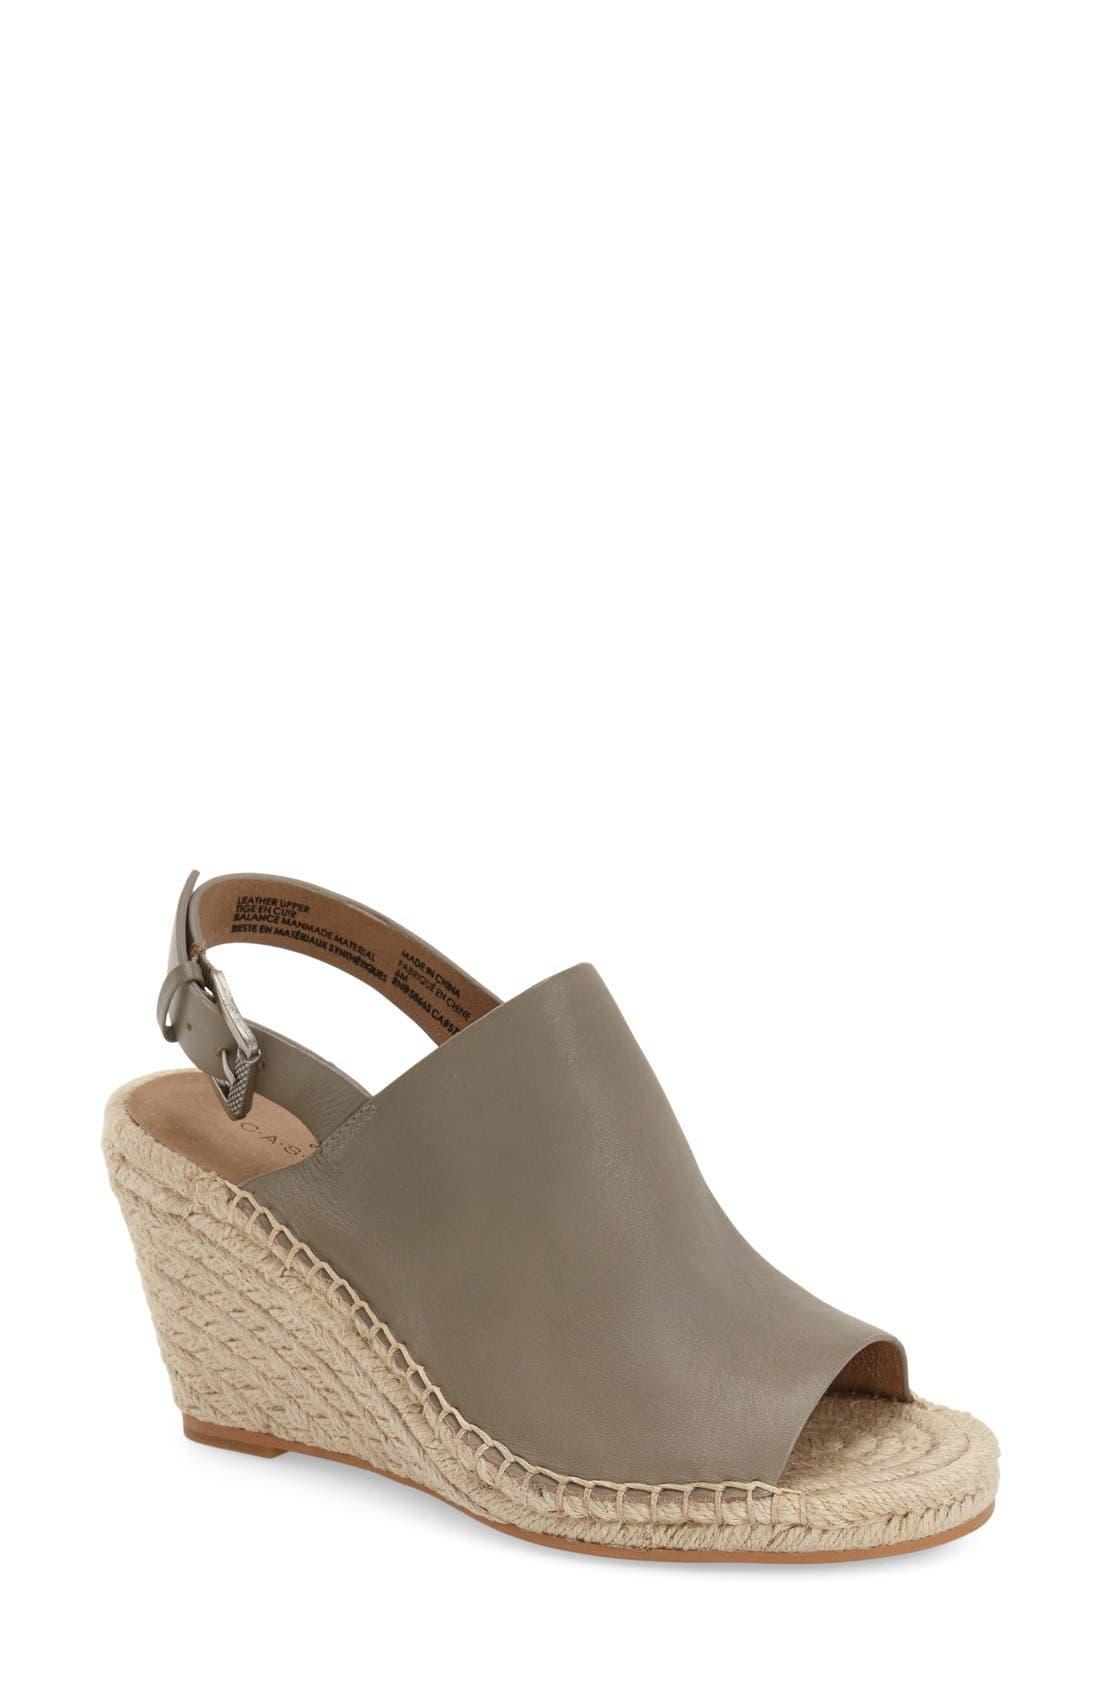 Alternate Image 1 Selected - Caslon® Sutton Slingback Sandal (Women)